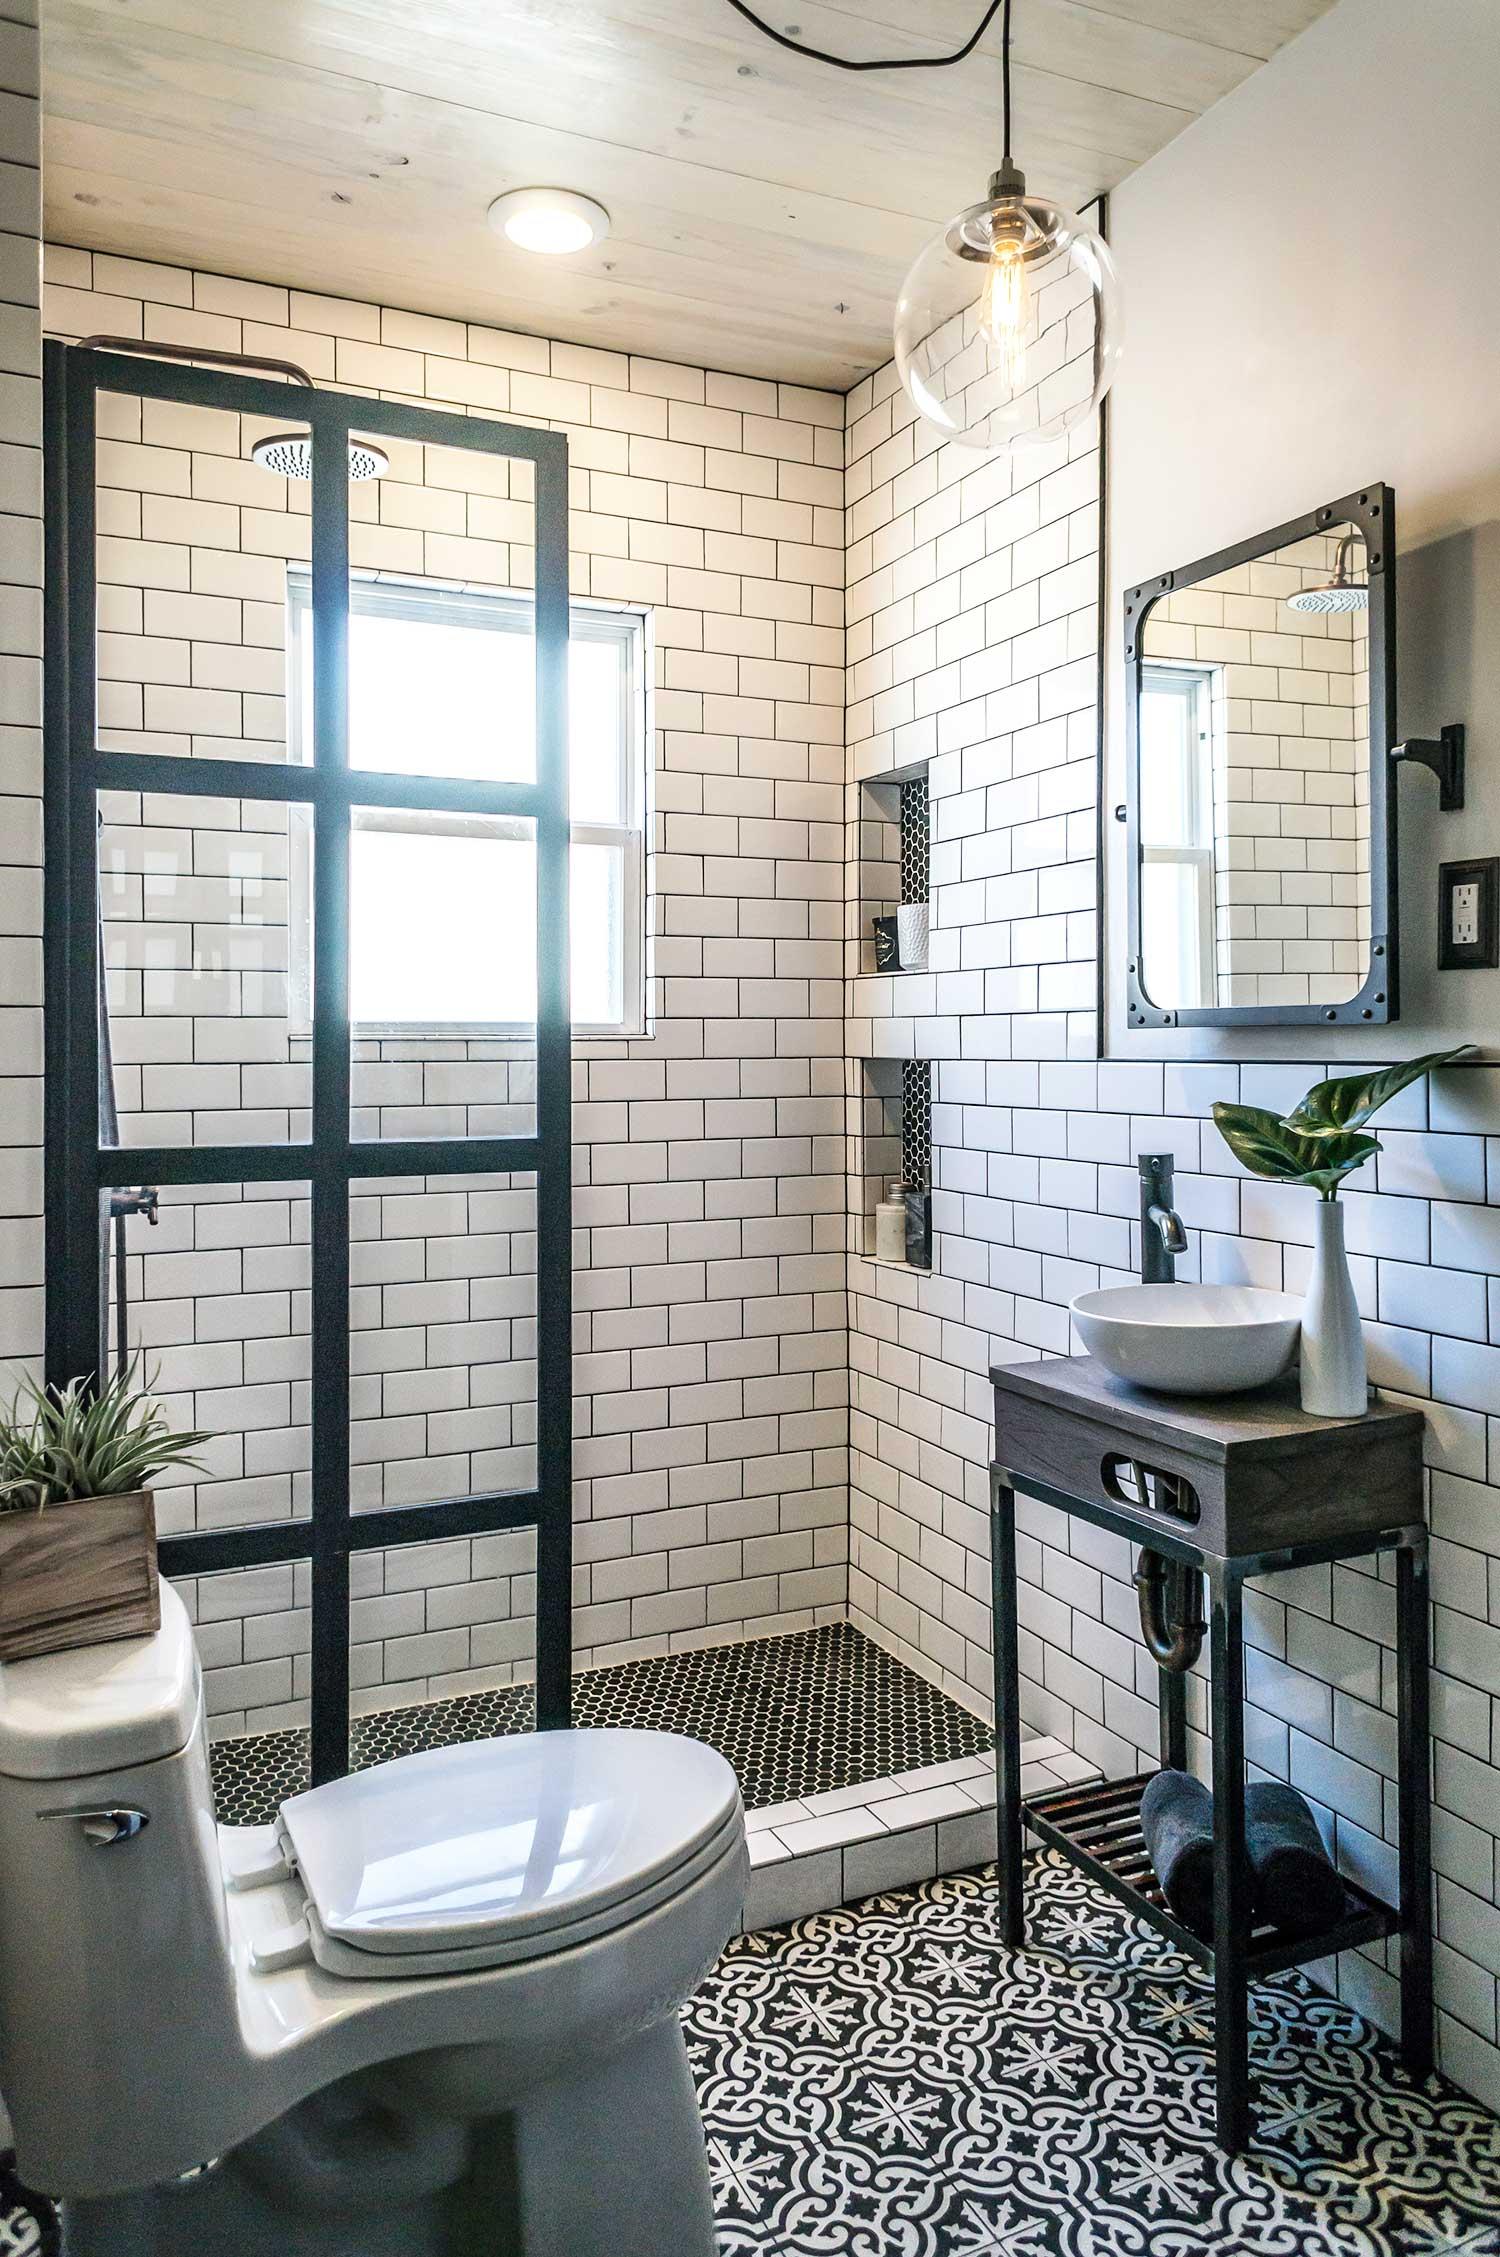 31 Small Bathroom Design Ideas To Get Inspired on Small Bathroom Ideas id=16730